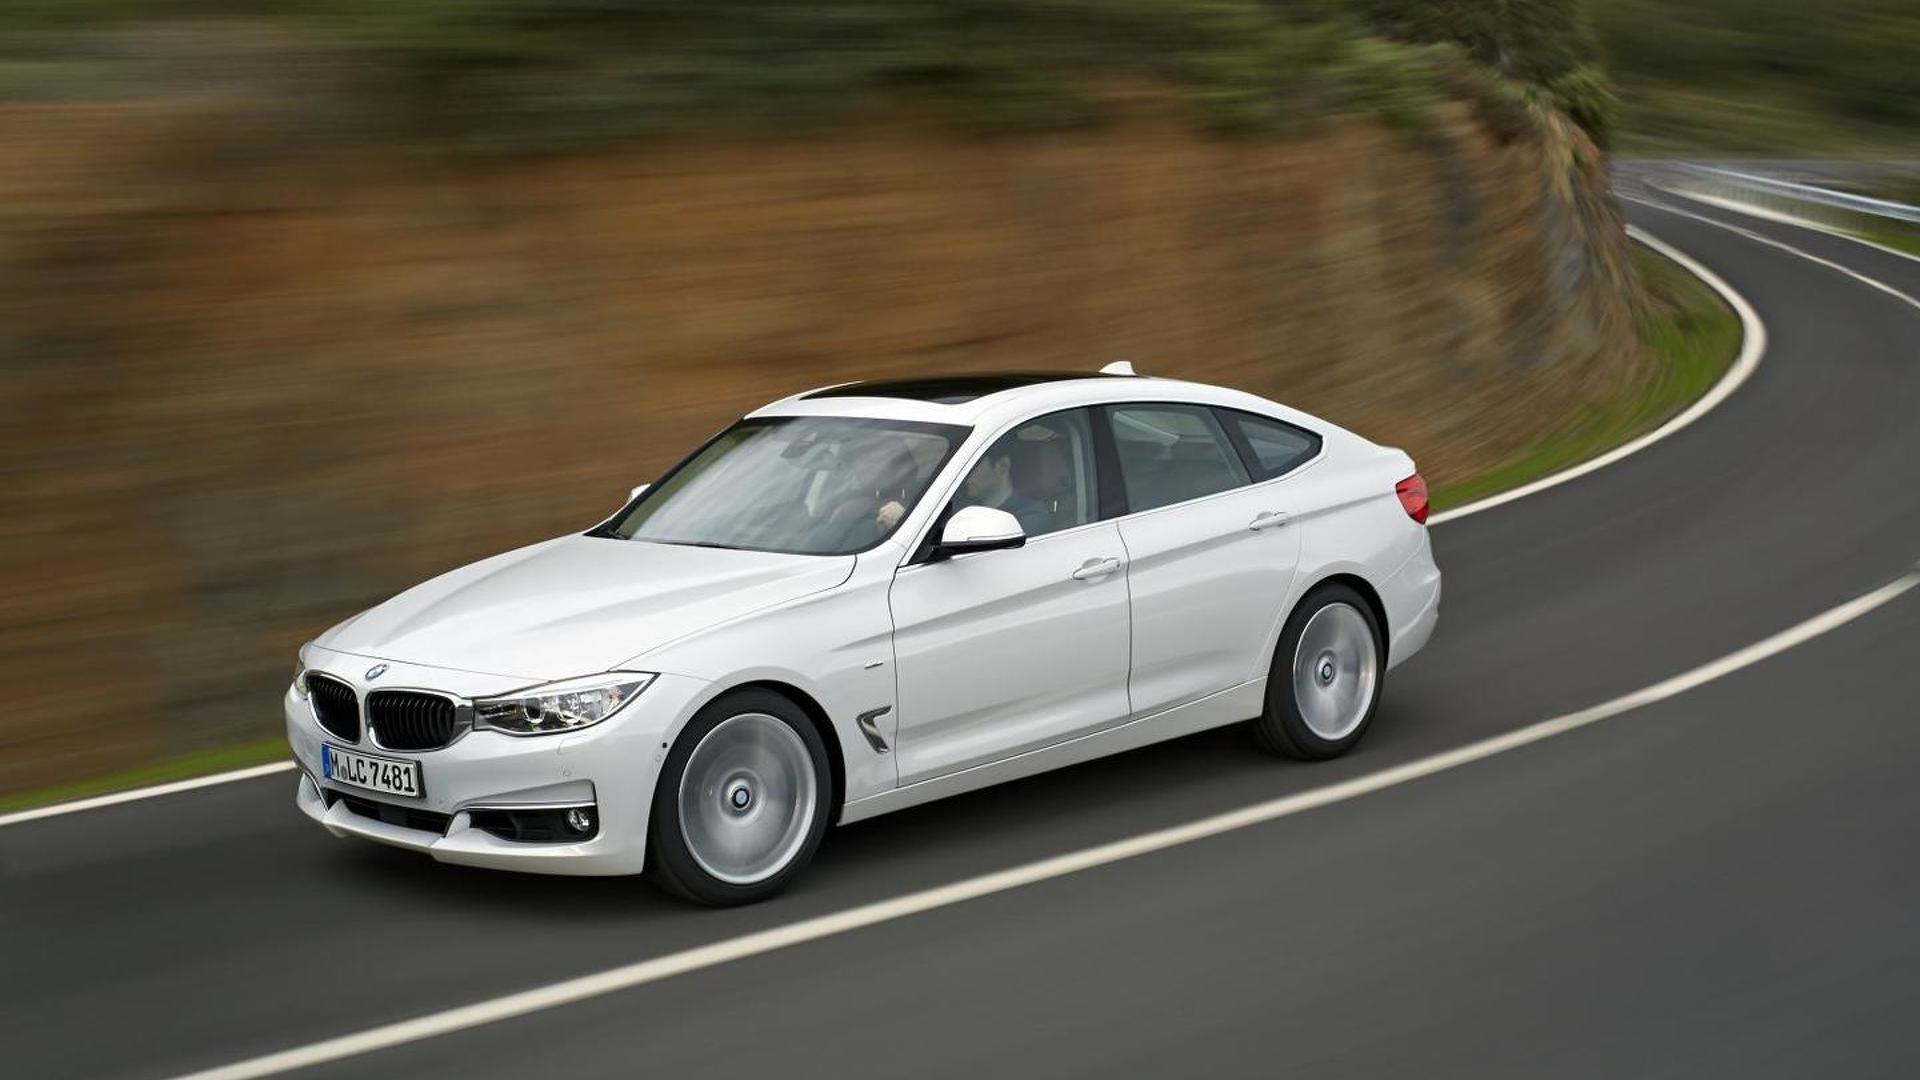 BMW 1-Series, 2-Series, 3-Series, 4-Series and X5 get new